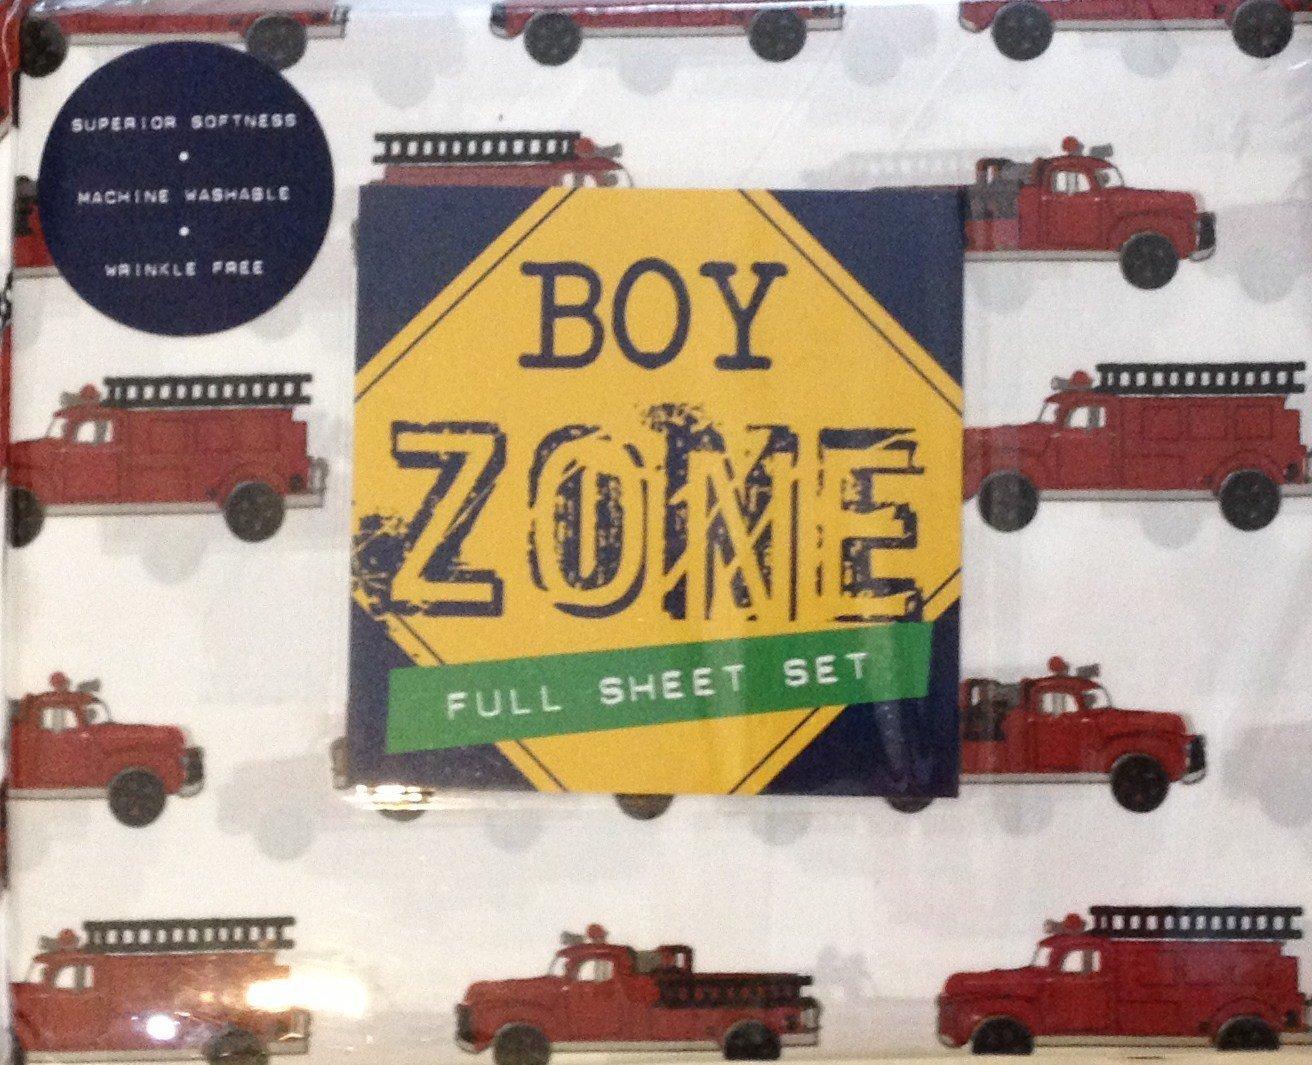 Boy Zone Full Sheet Set rot Fire Engine